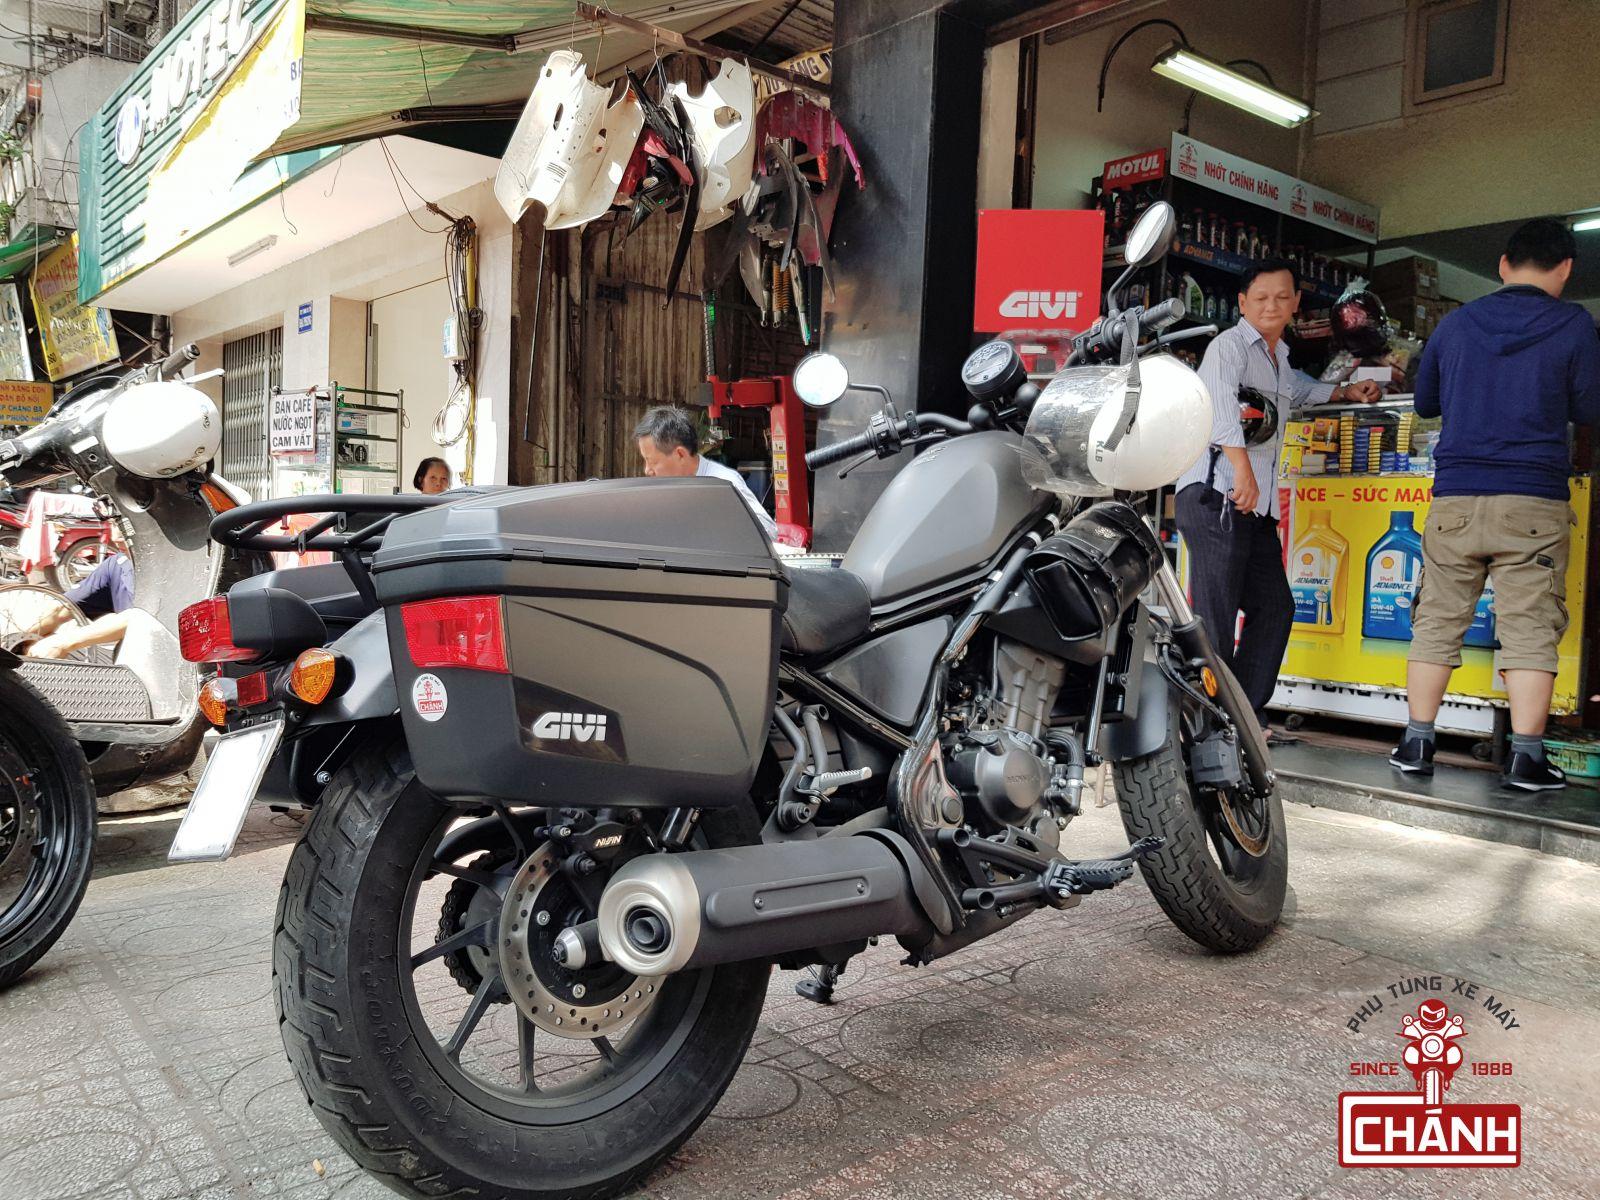 Thung-hong-givi-e22n-xe-honda-rebel-300-3